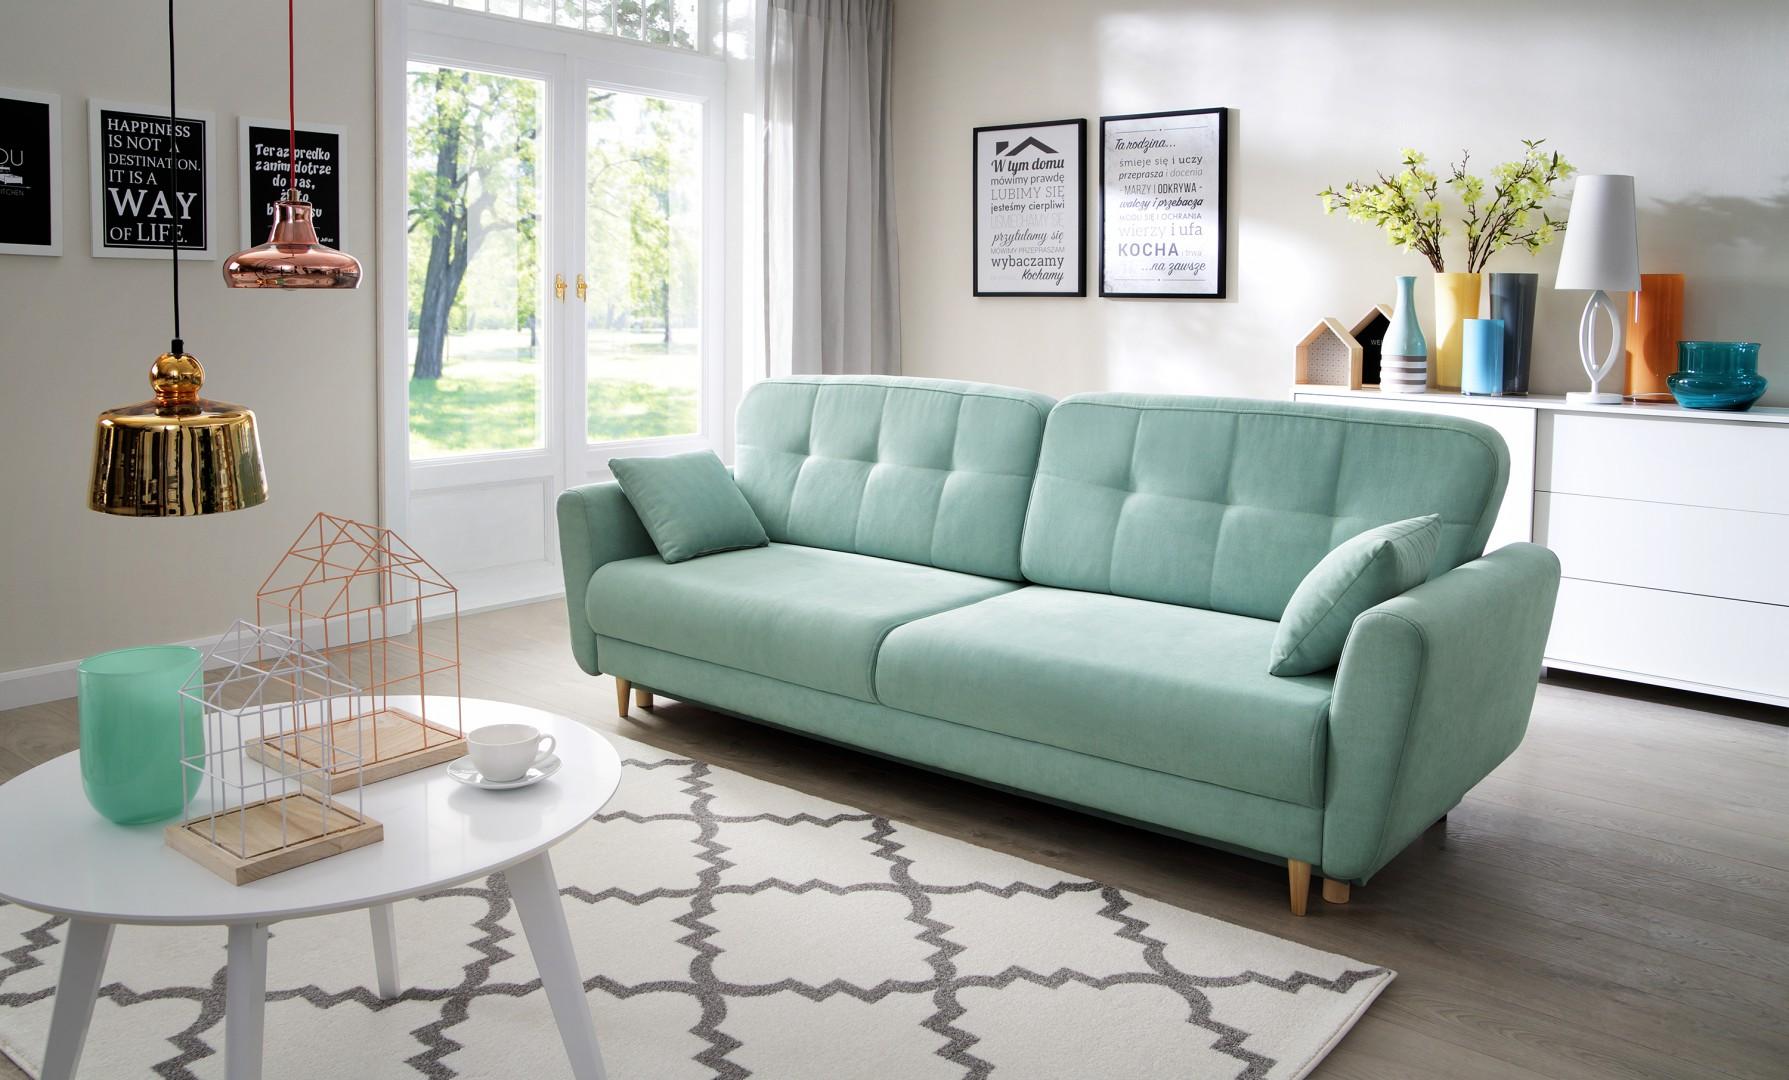 Sofa Dakota. Fot. Agata S.A.